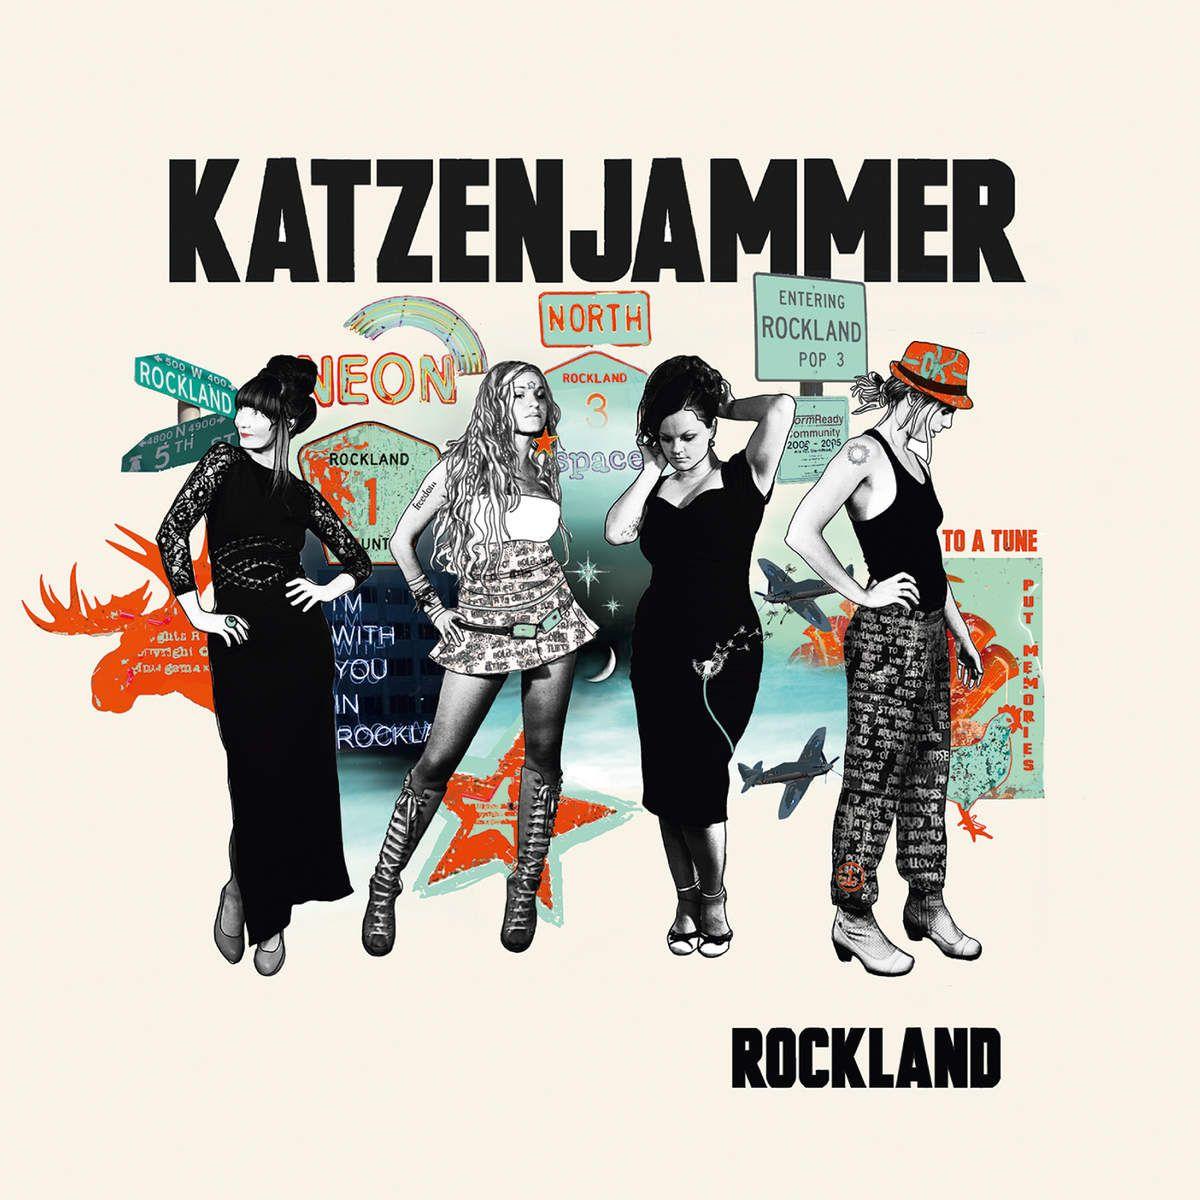 Katzenjammer - Rockland album cover